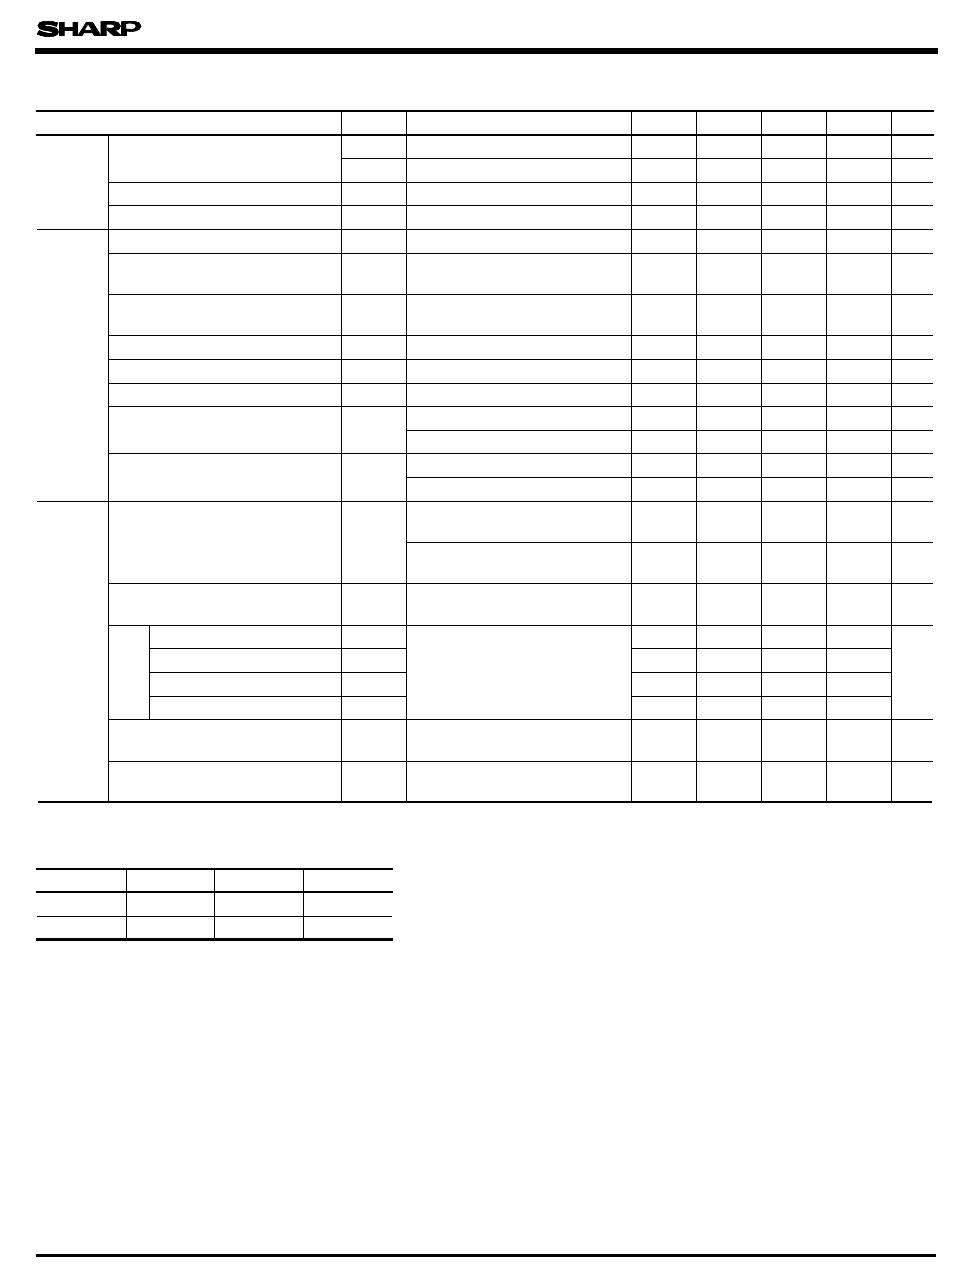 Pc922 datasheet